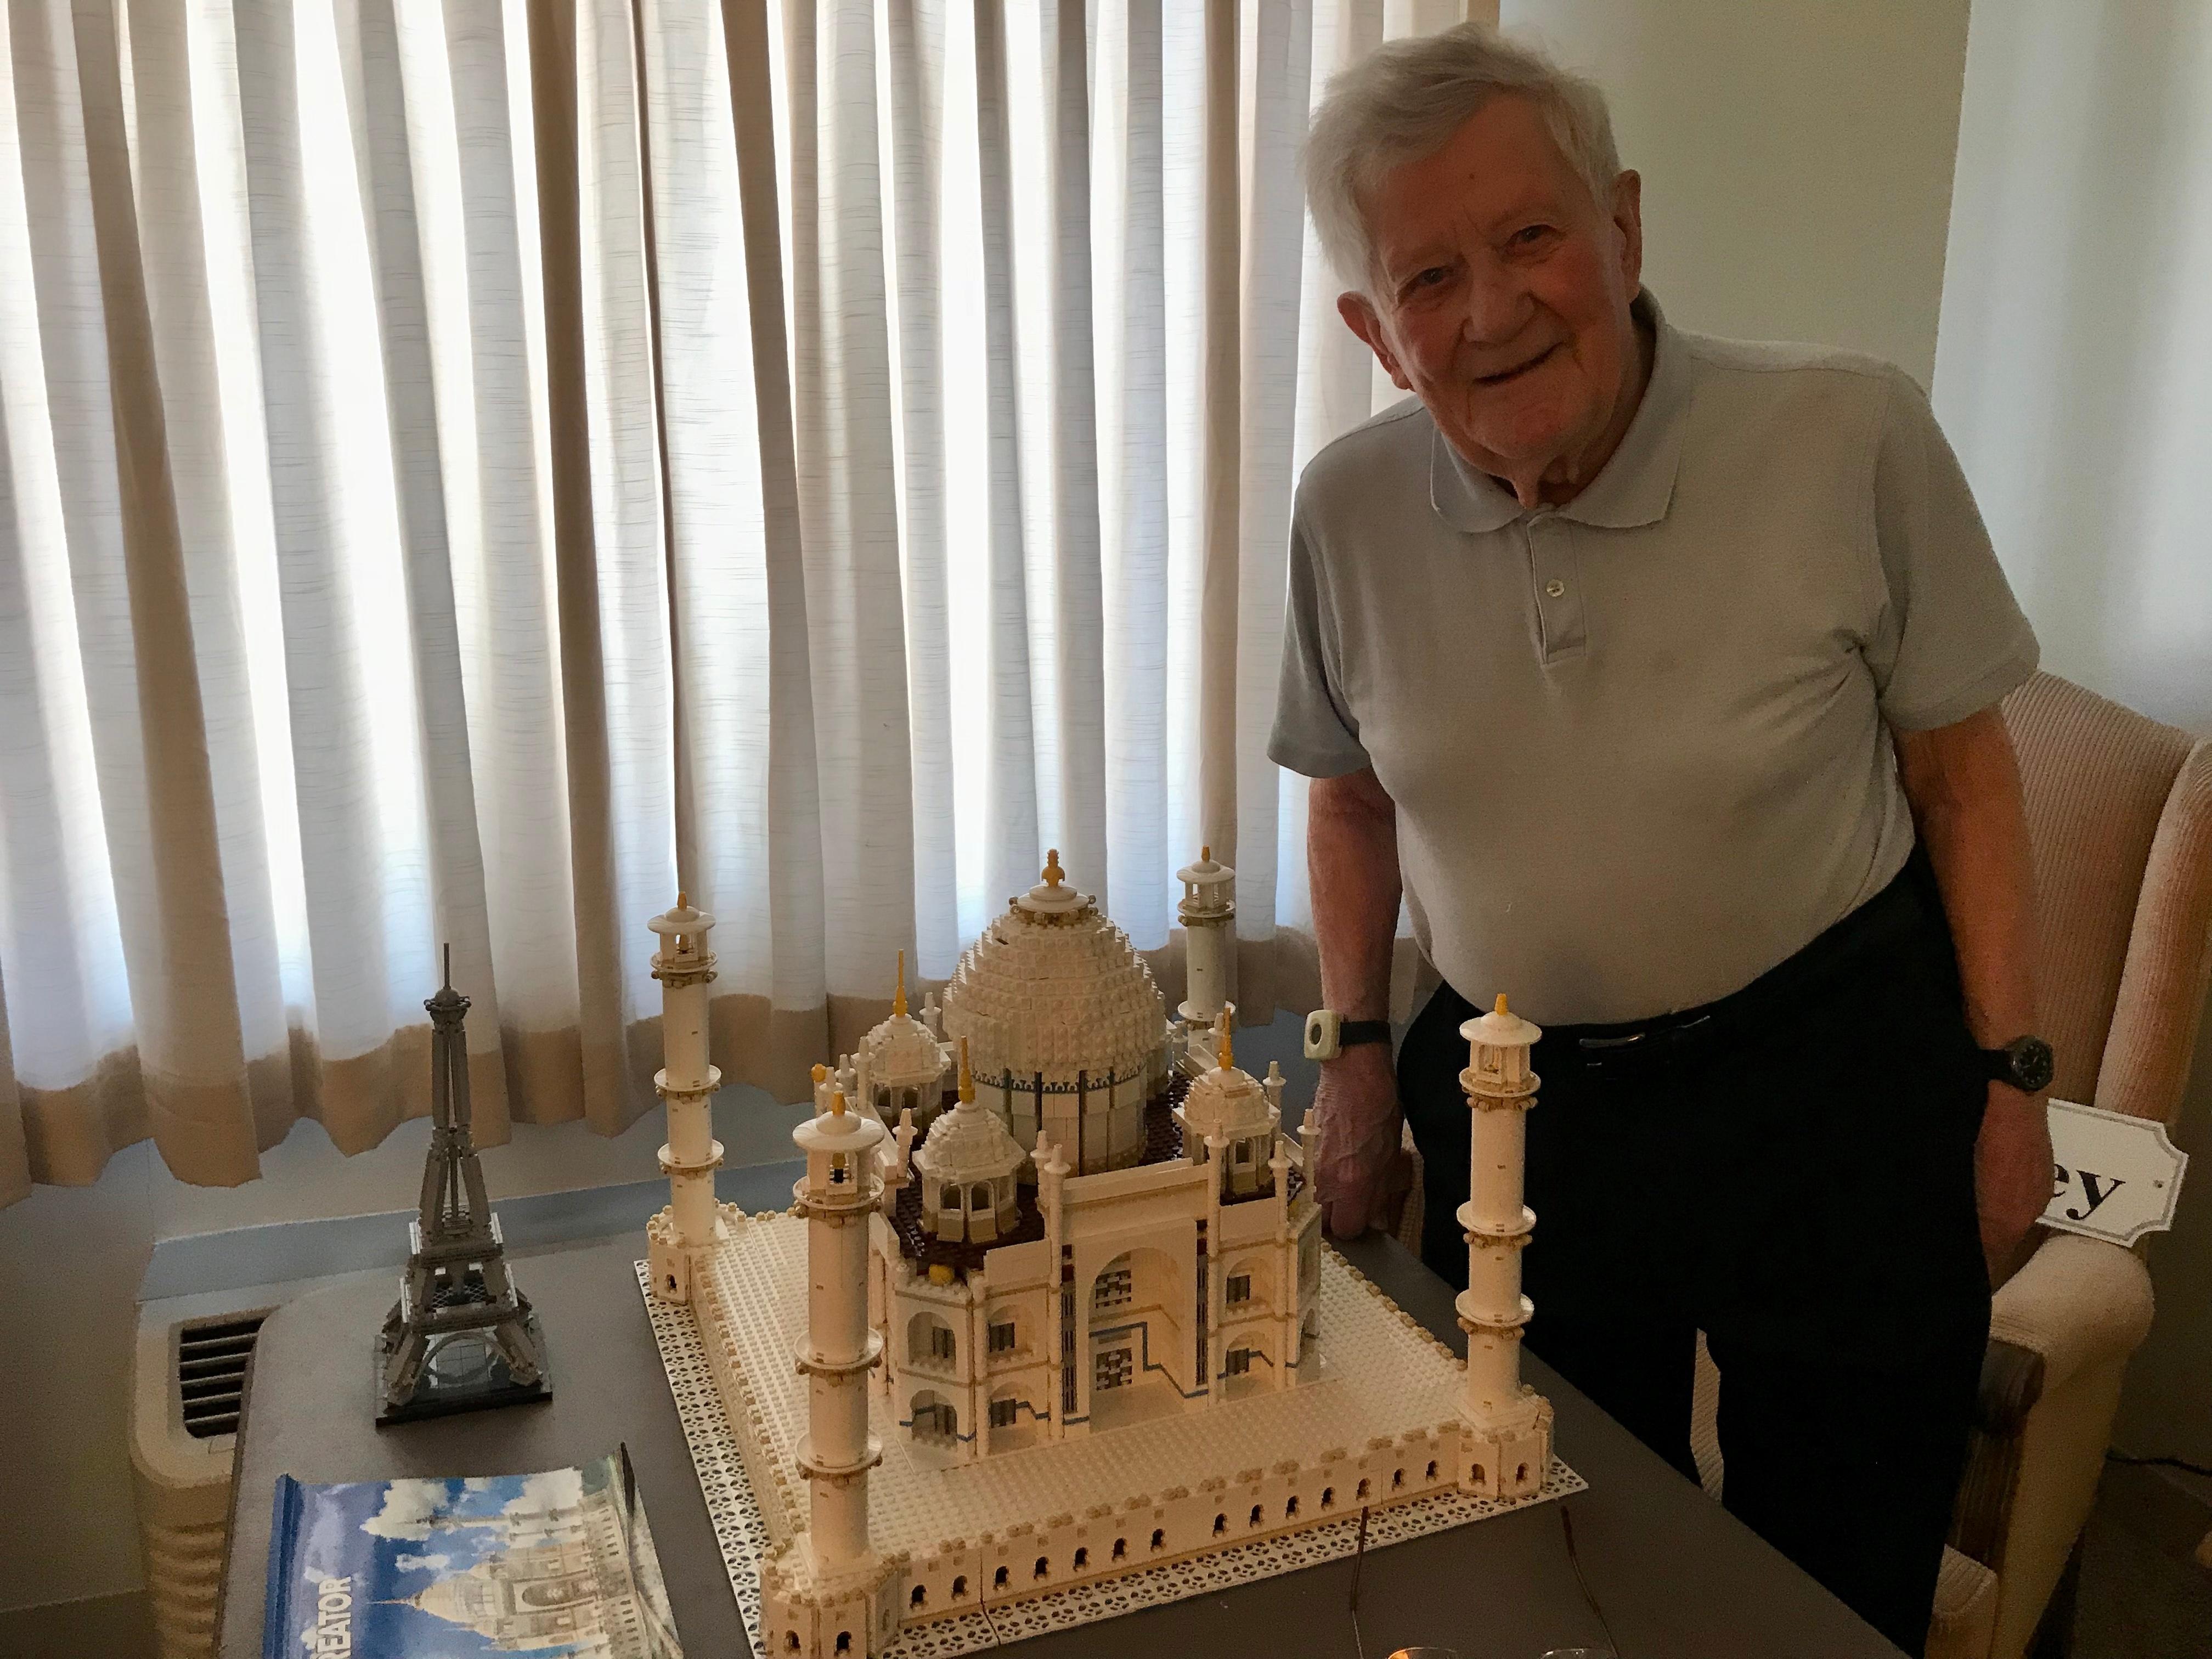 Don Walkley completes 6,000 piece LEGO set